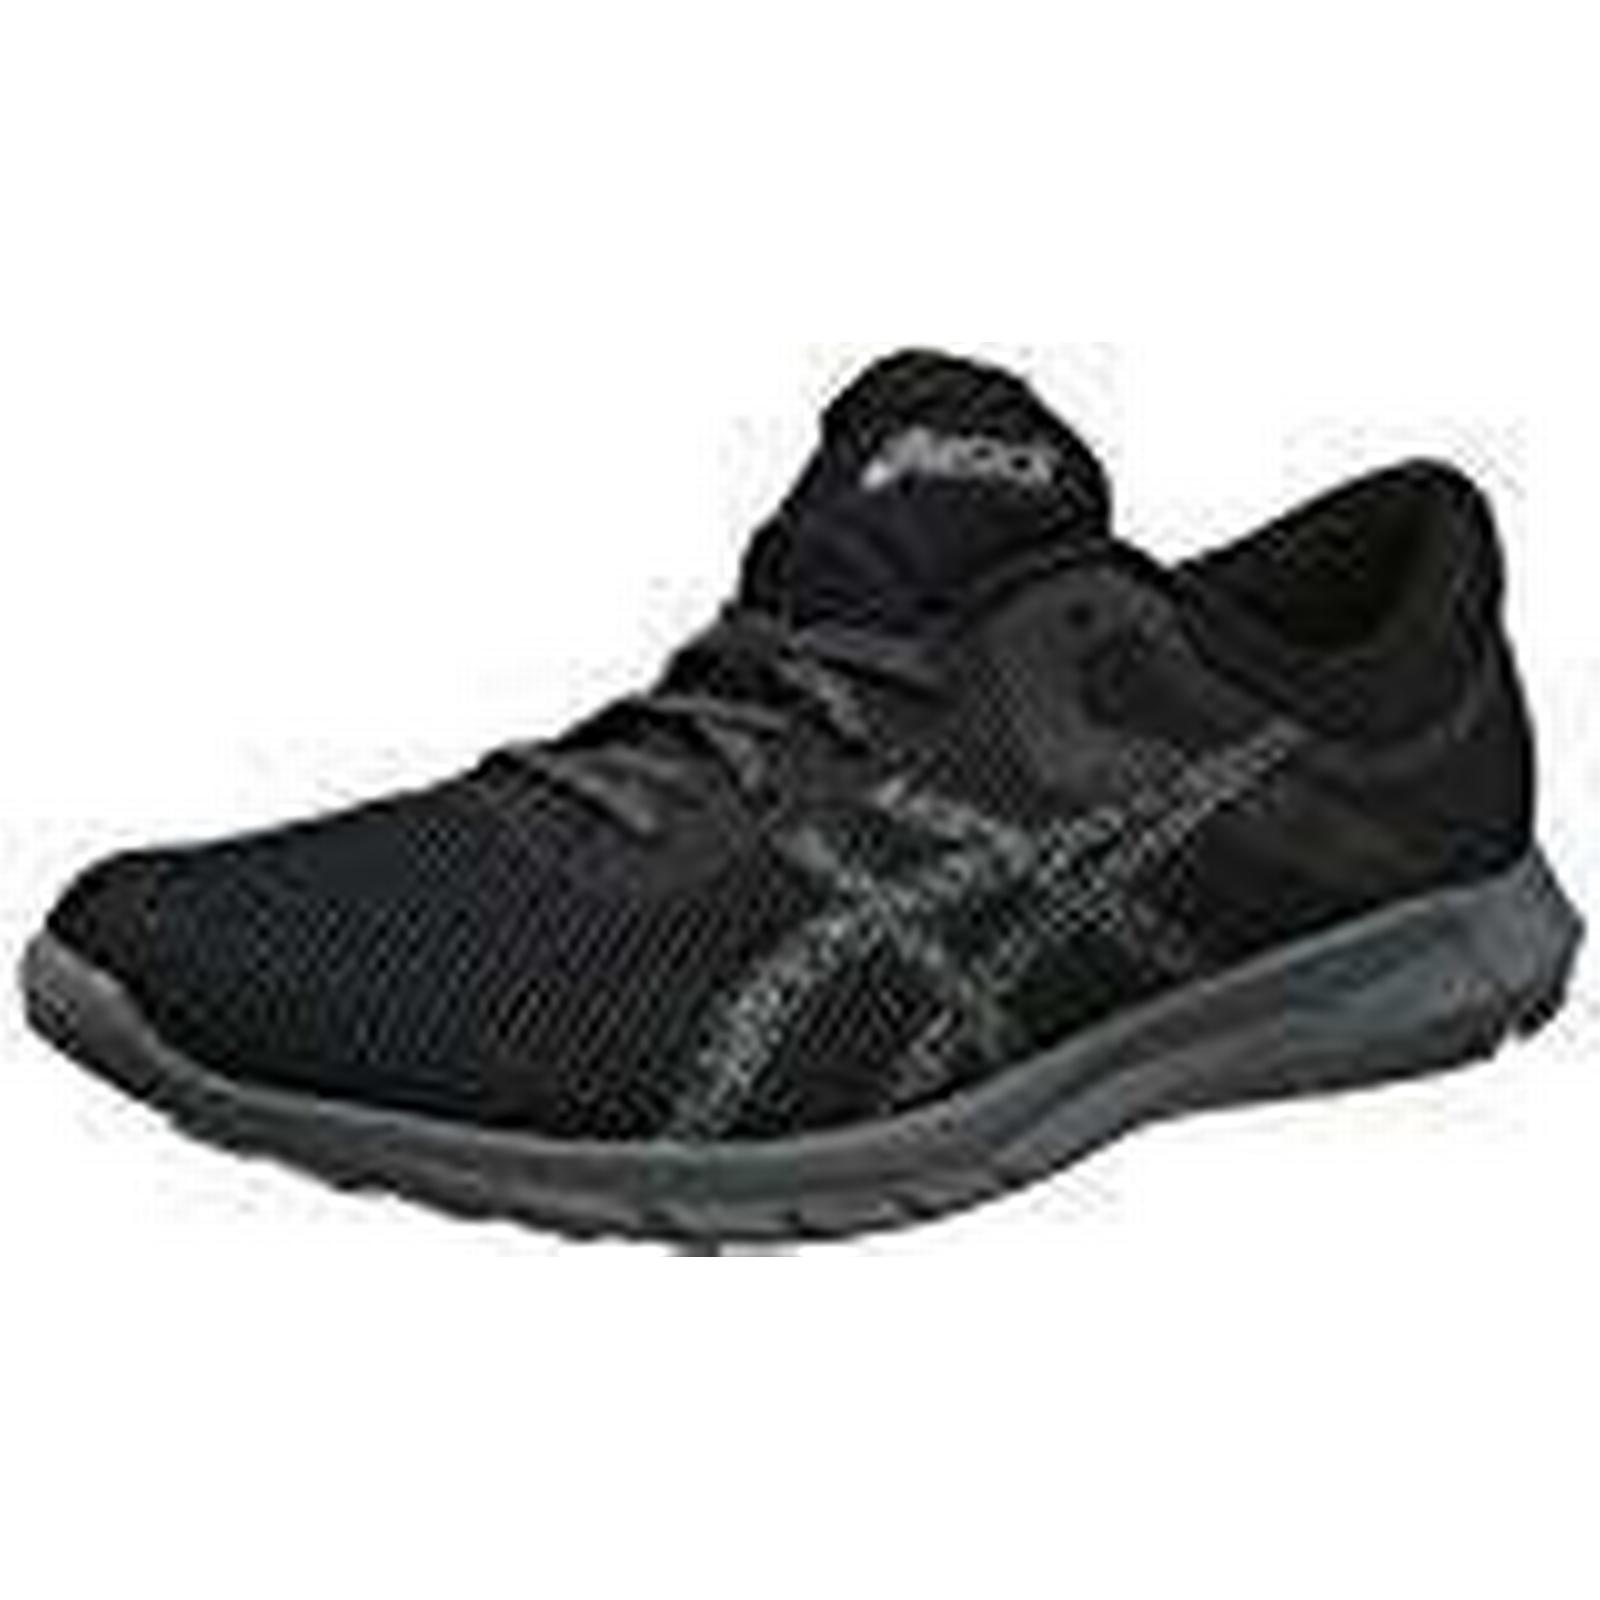 Asics Men's Nitrofuze 2 13 Running Shoes, Grey (Carbonblackcarbon 9790), 13 2 UK 7b424a